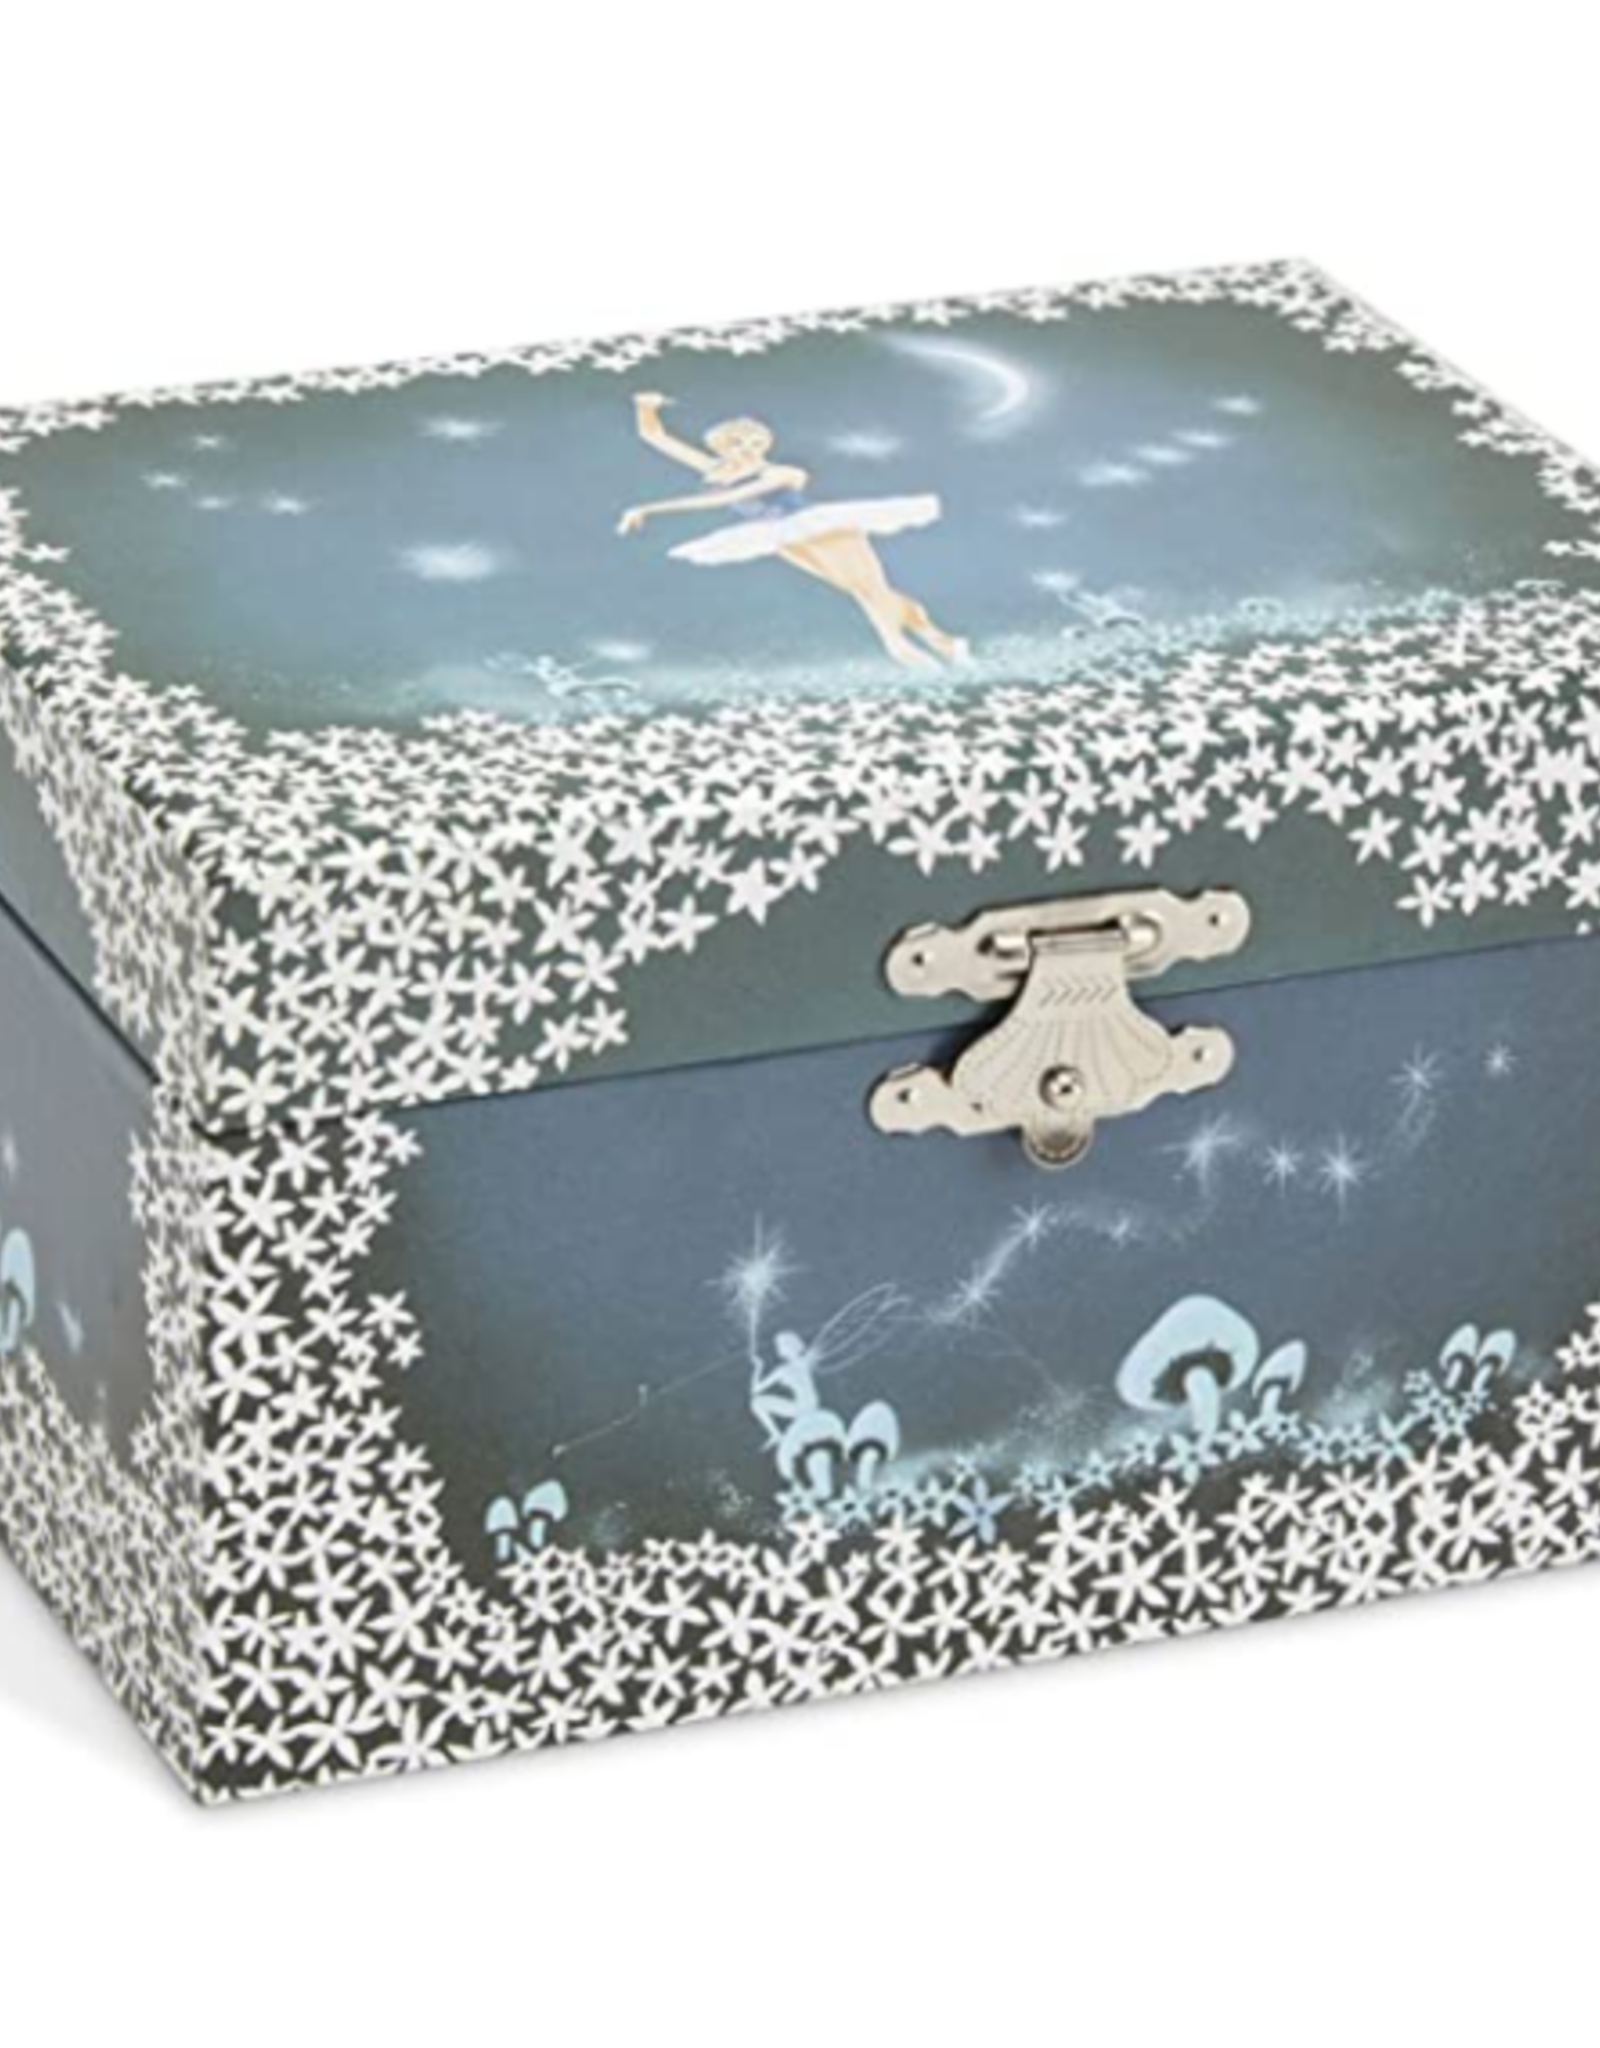 Jewelkeeper Musical Jewelry Box ballerina 2